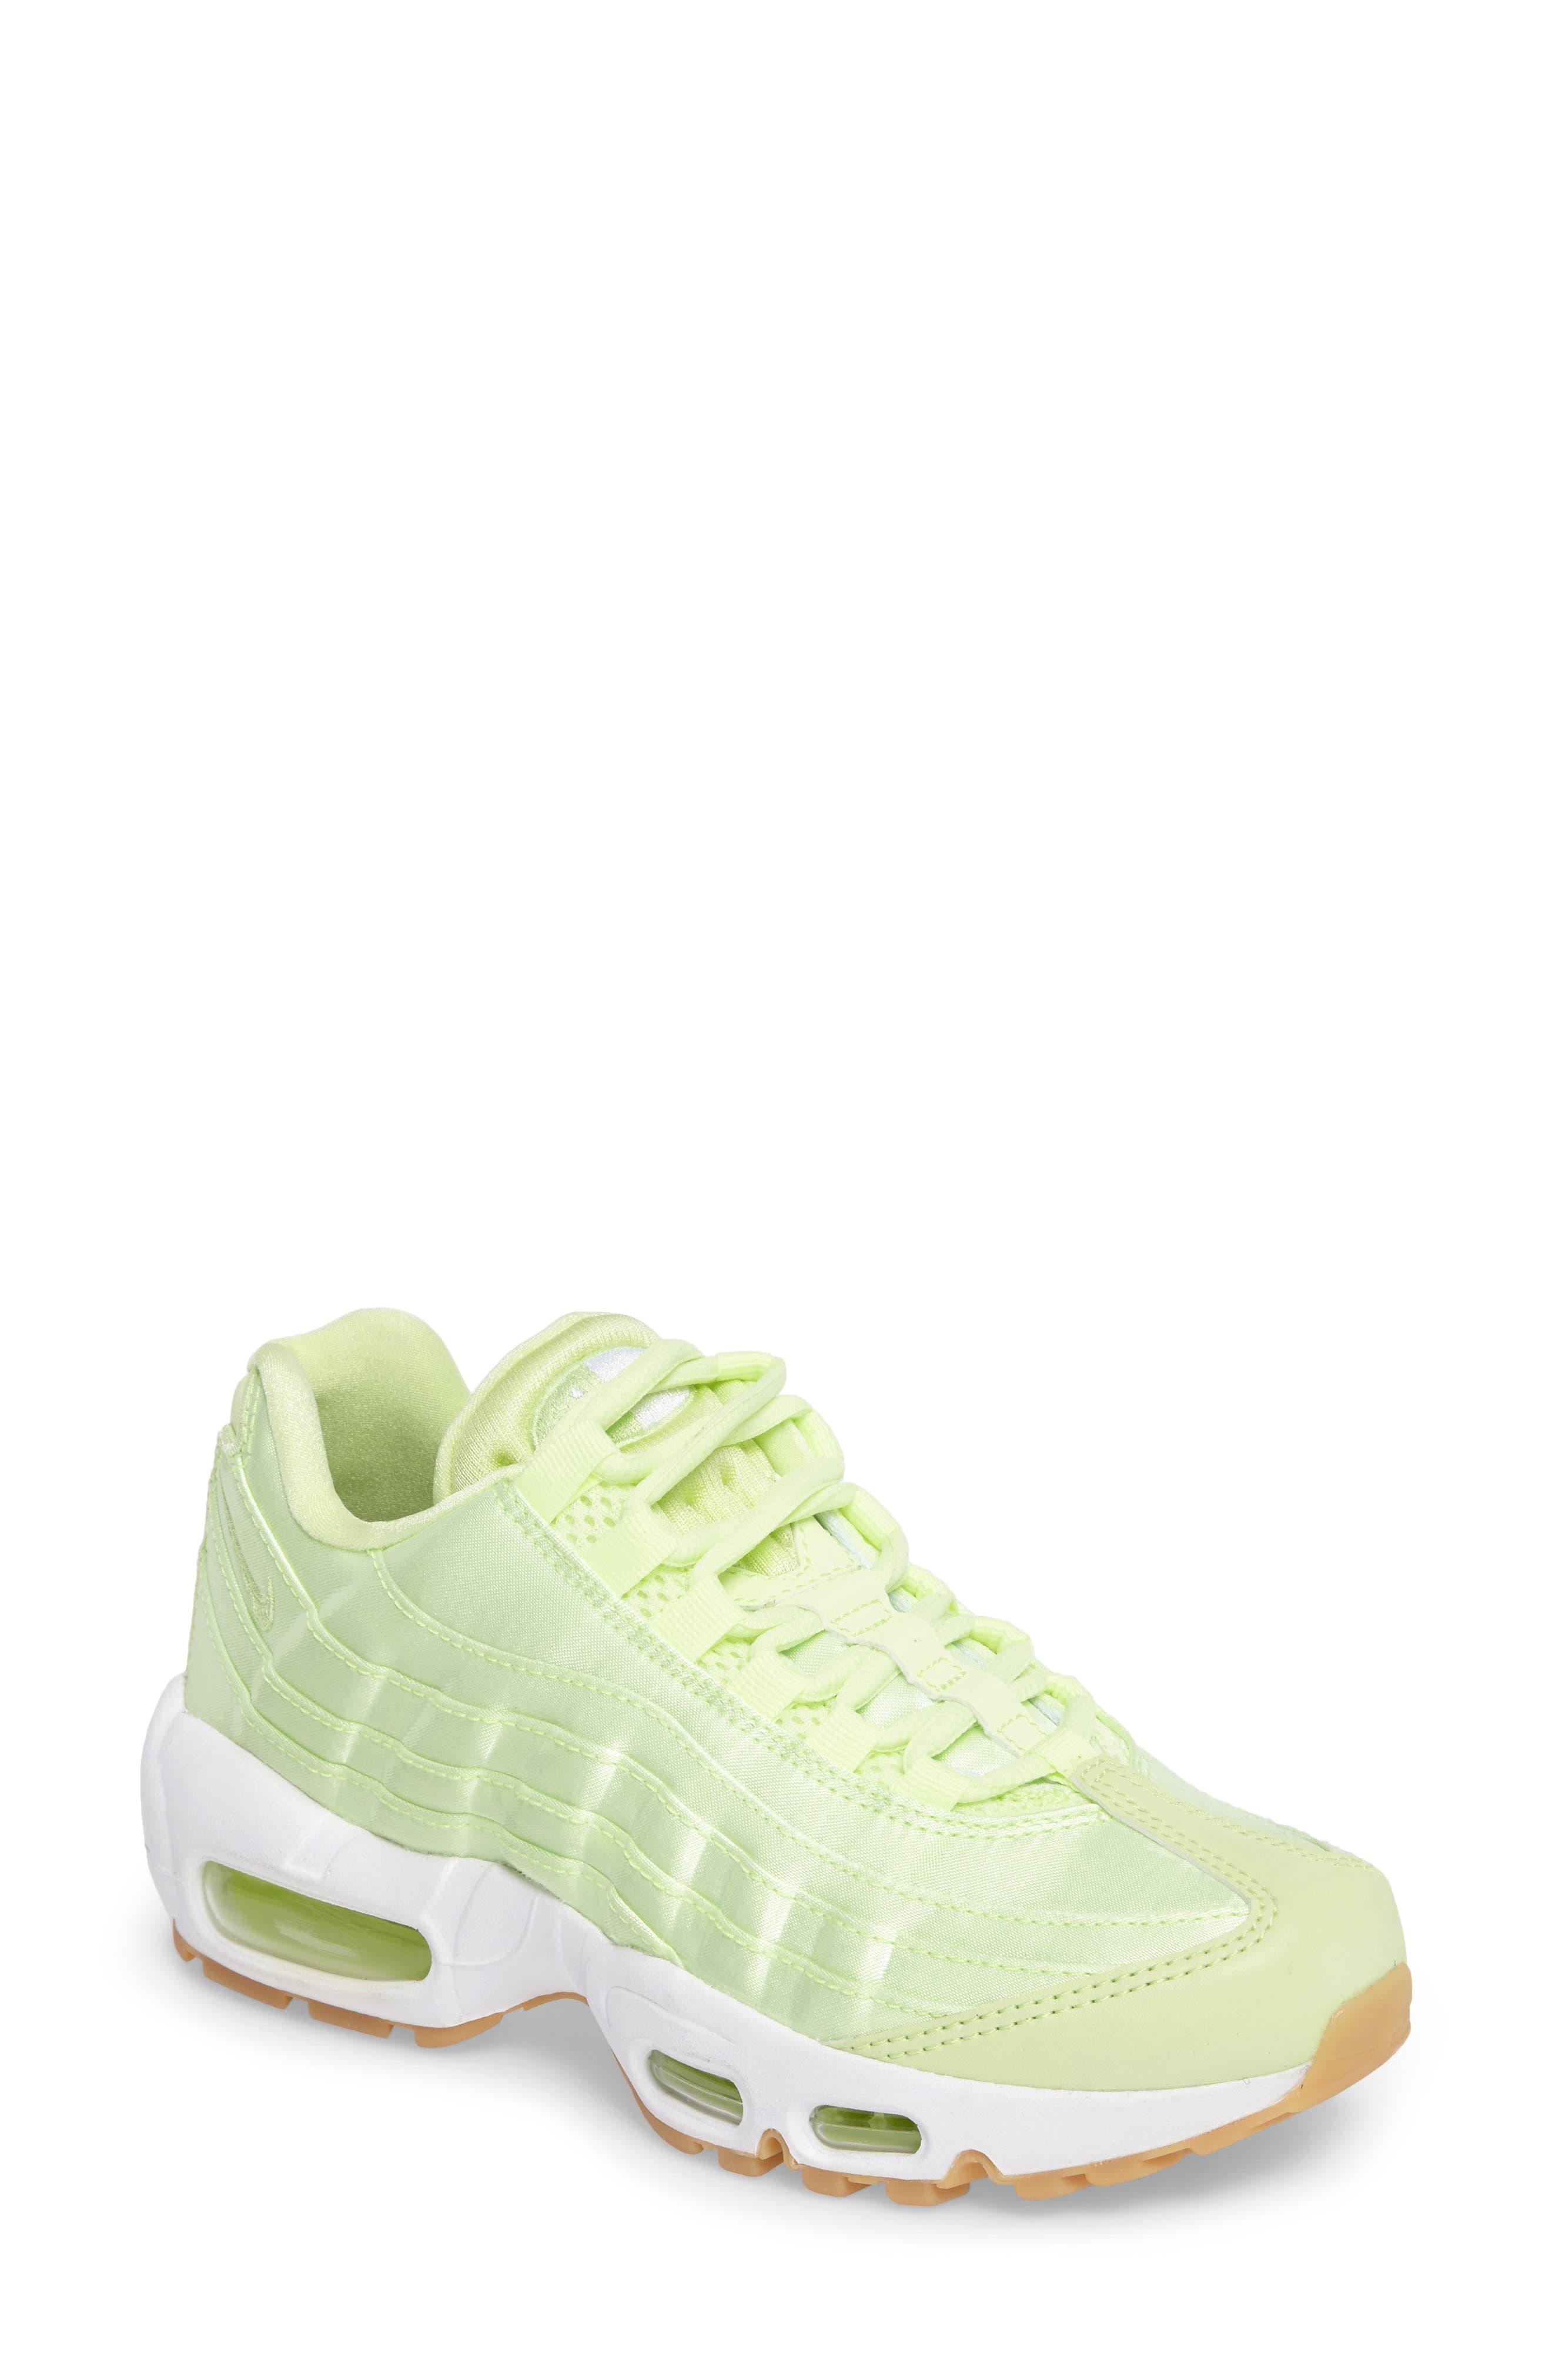 Air Max 95 QS Running Shoe,                             Main thumbnail 1, color,                             300